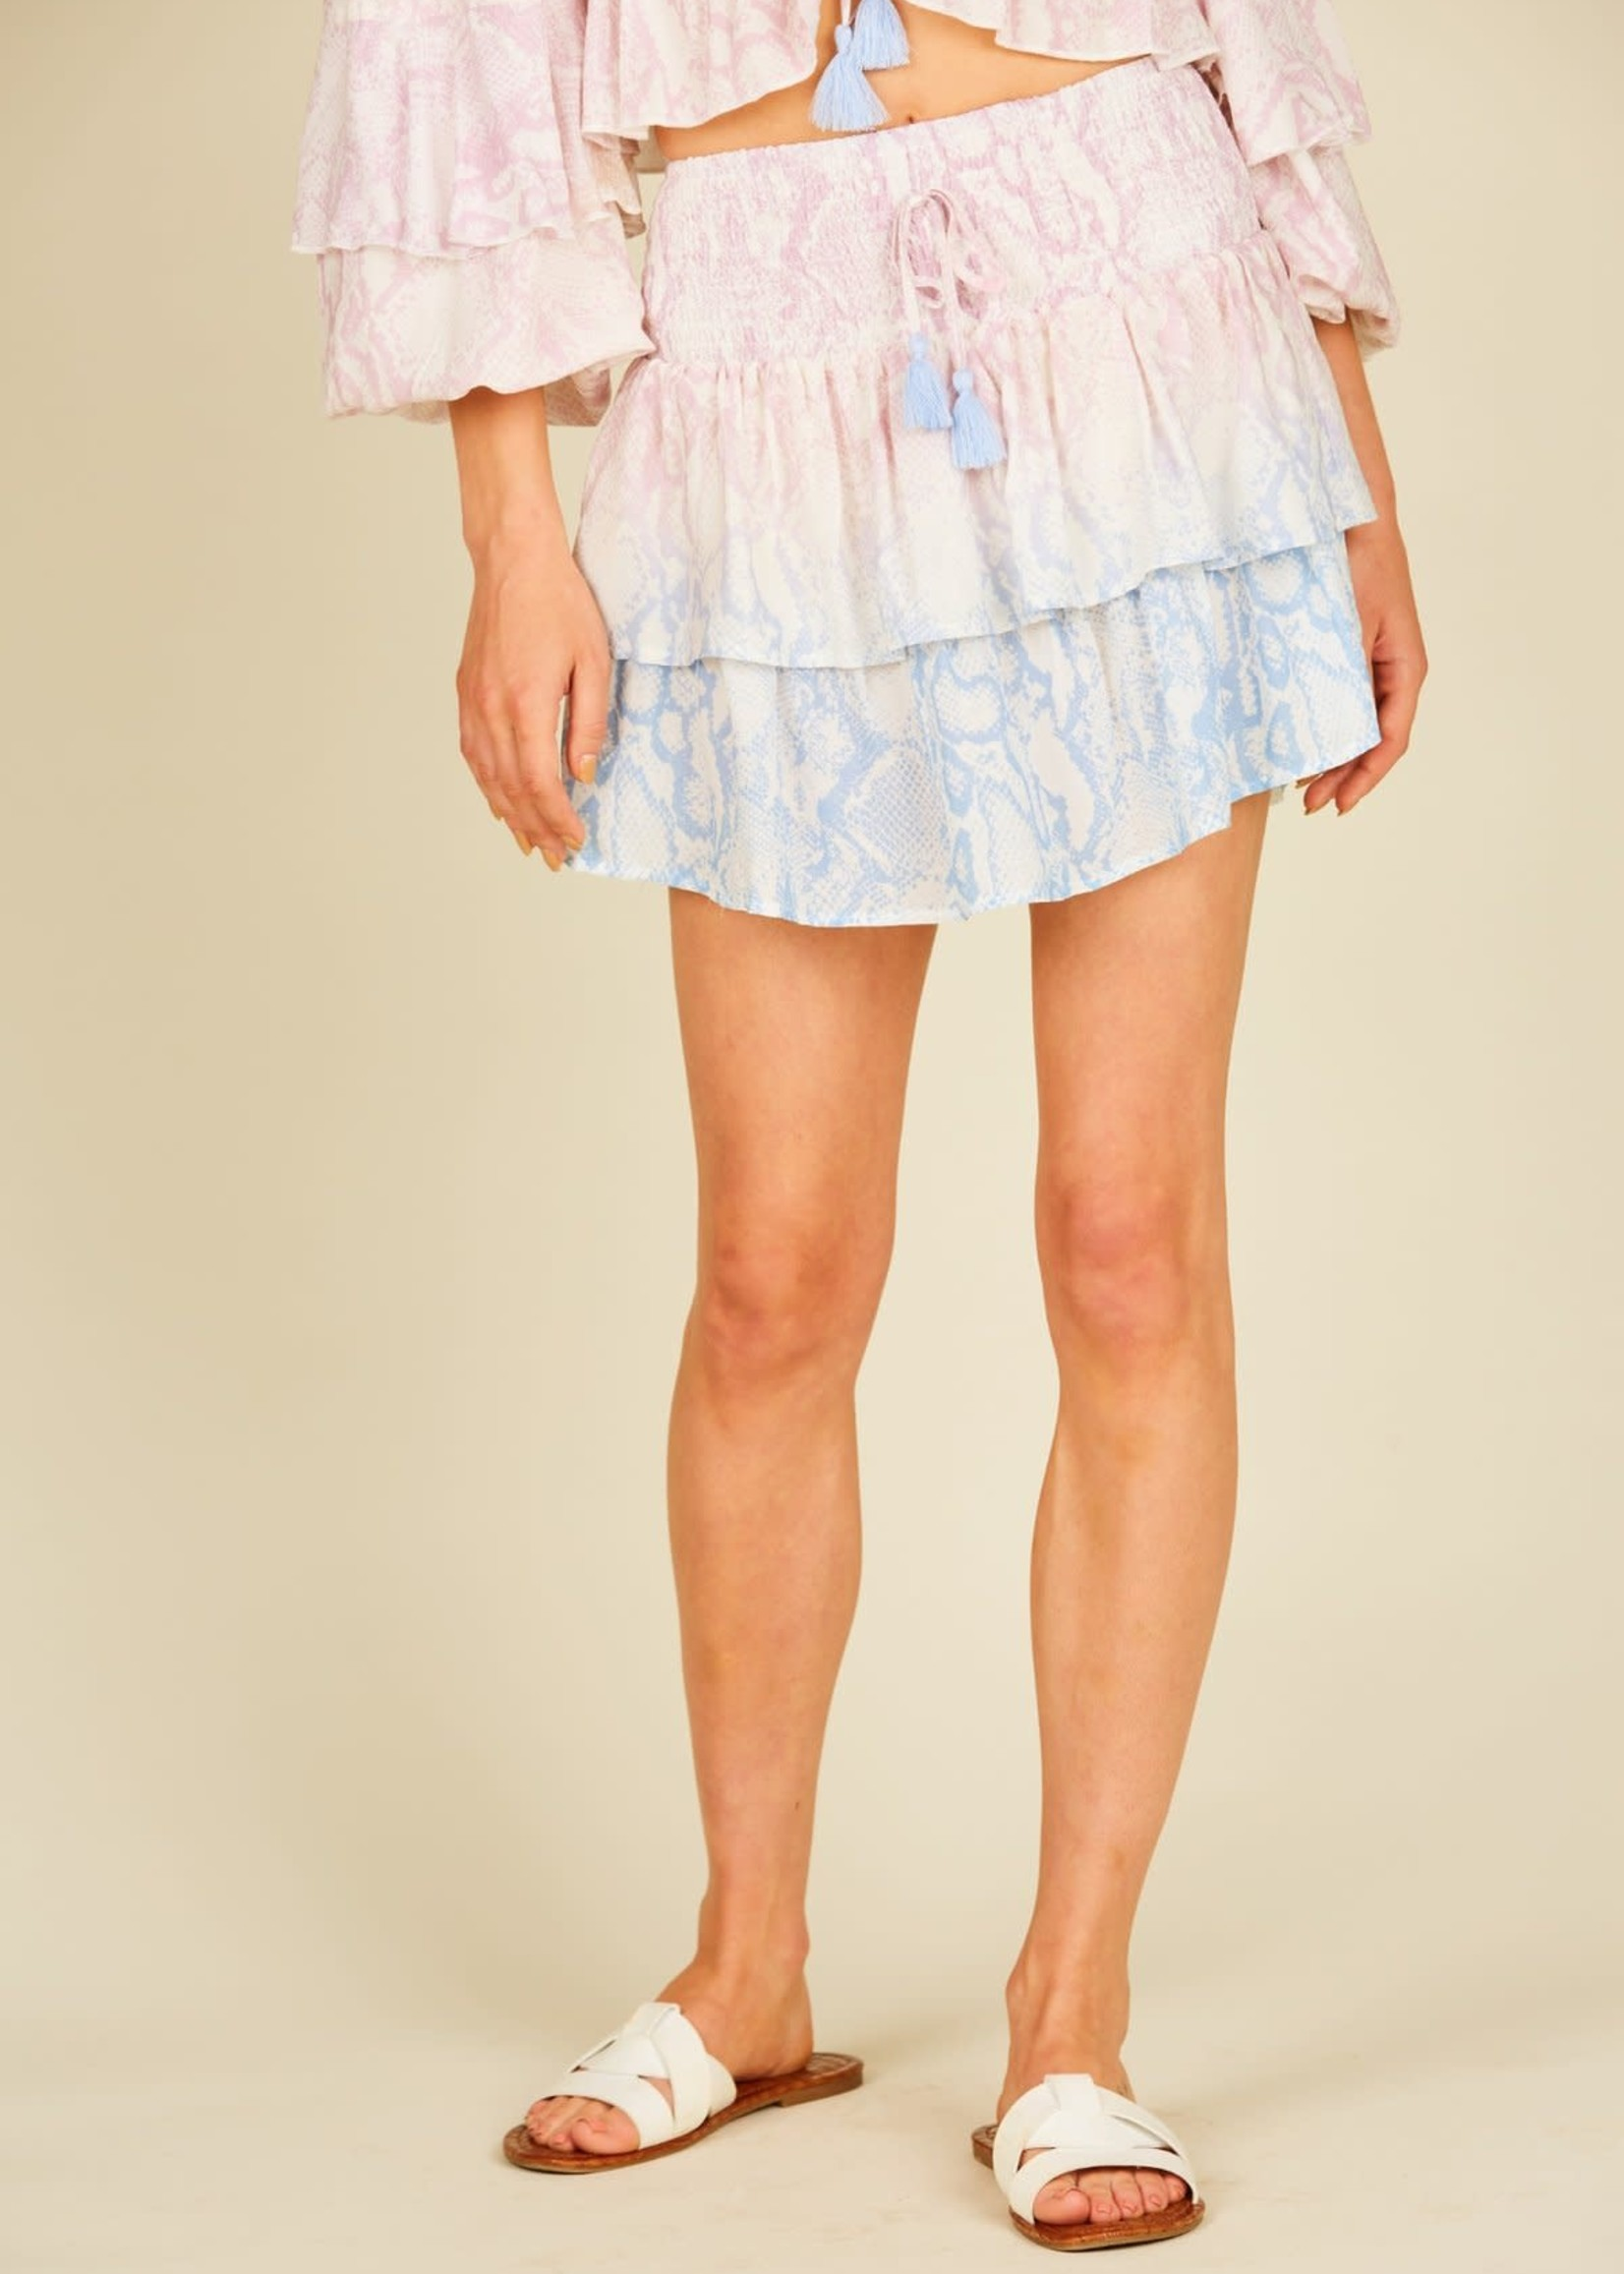 Surf Gypsy Ombrè Snakeskin Ruffle Mini Skirt